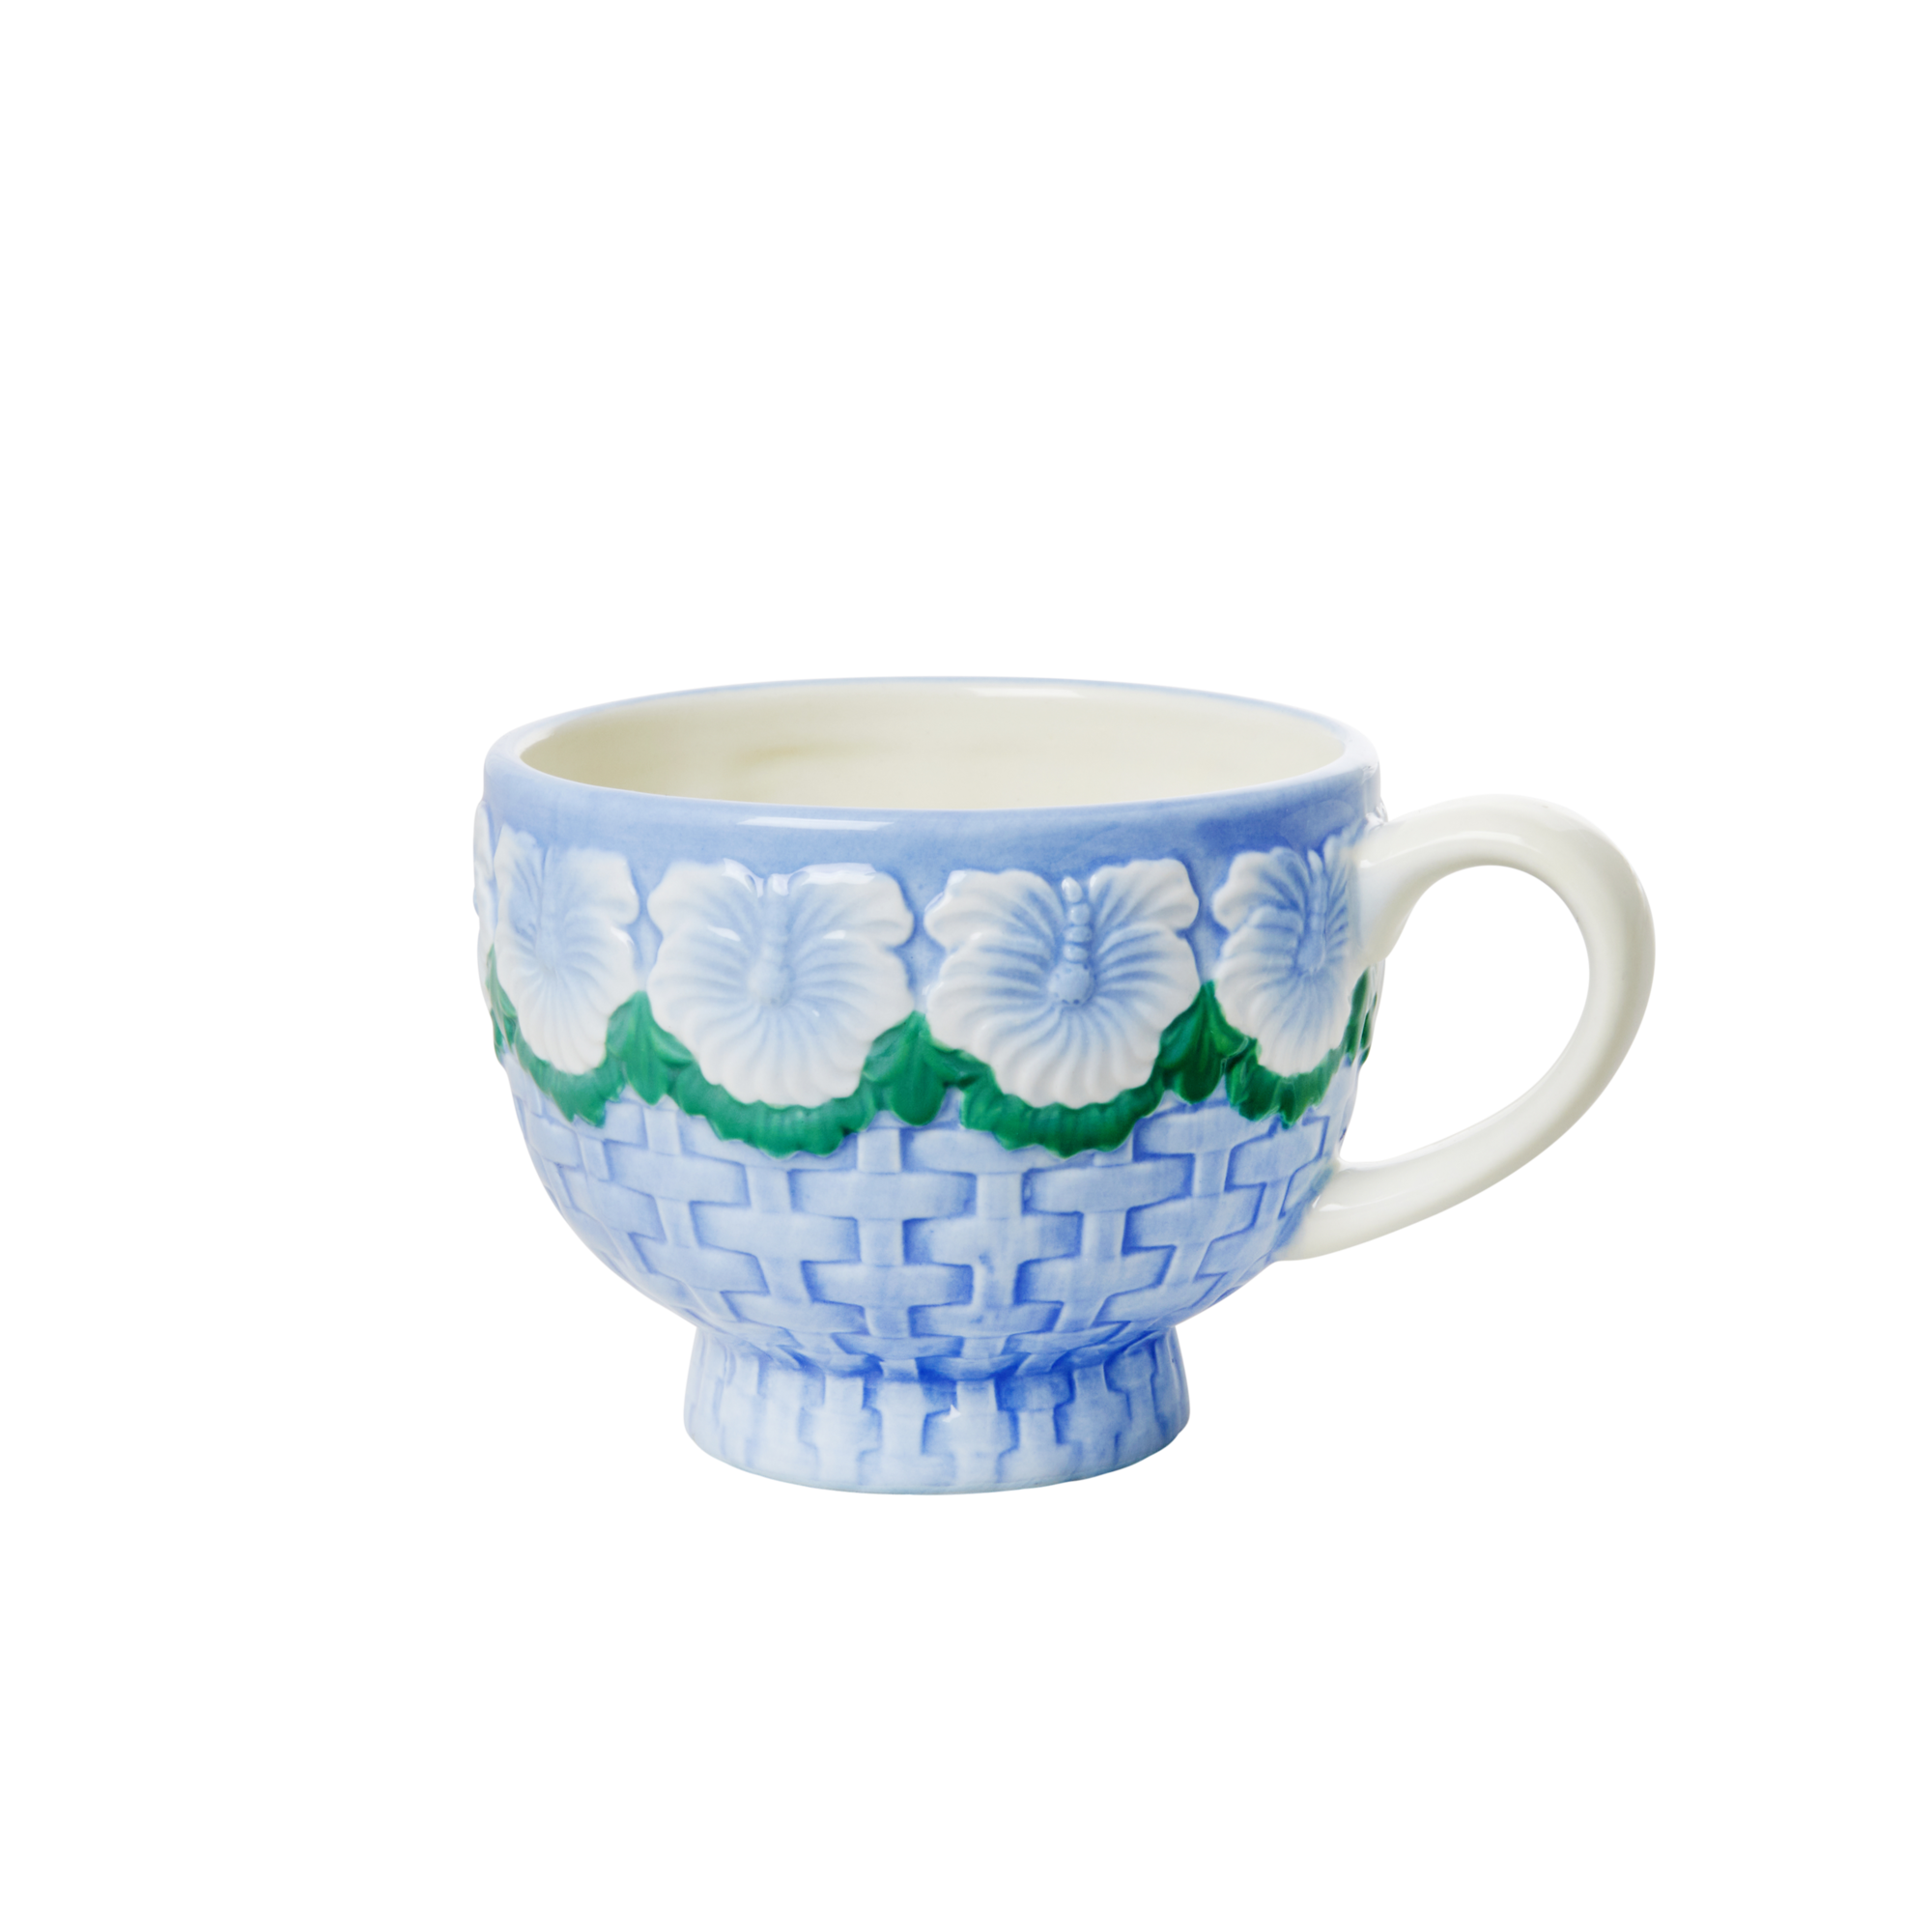 Rice - Ceramic Mug - Embossed Blue Flower Design